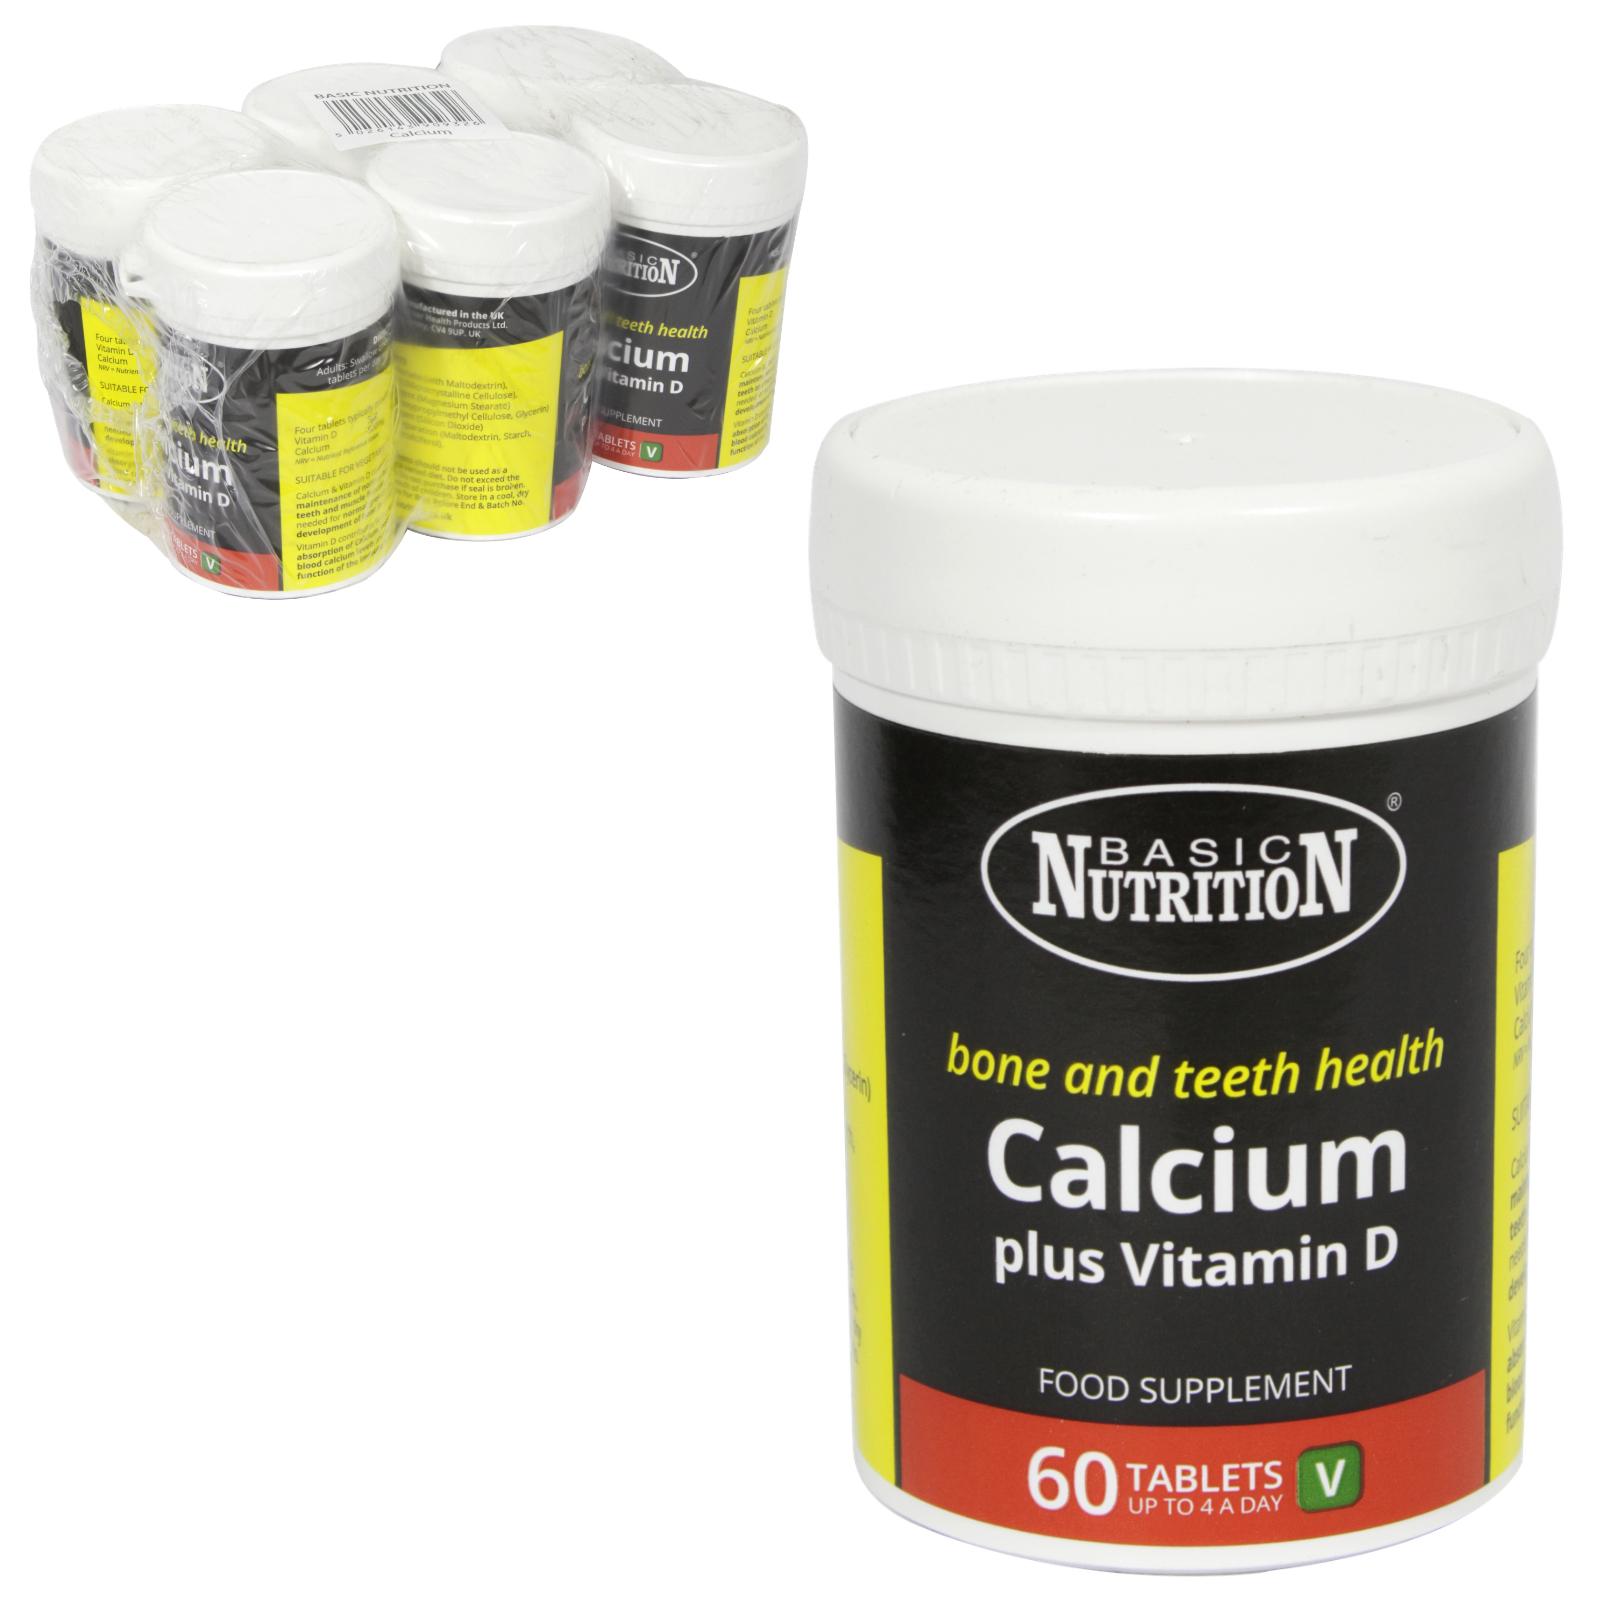 BASIC NUTRITION CALCIUM+VIT D 60X200MG X6